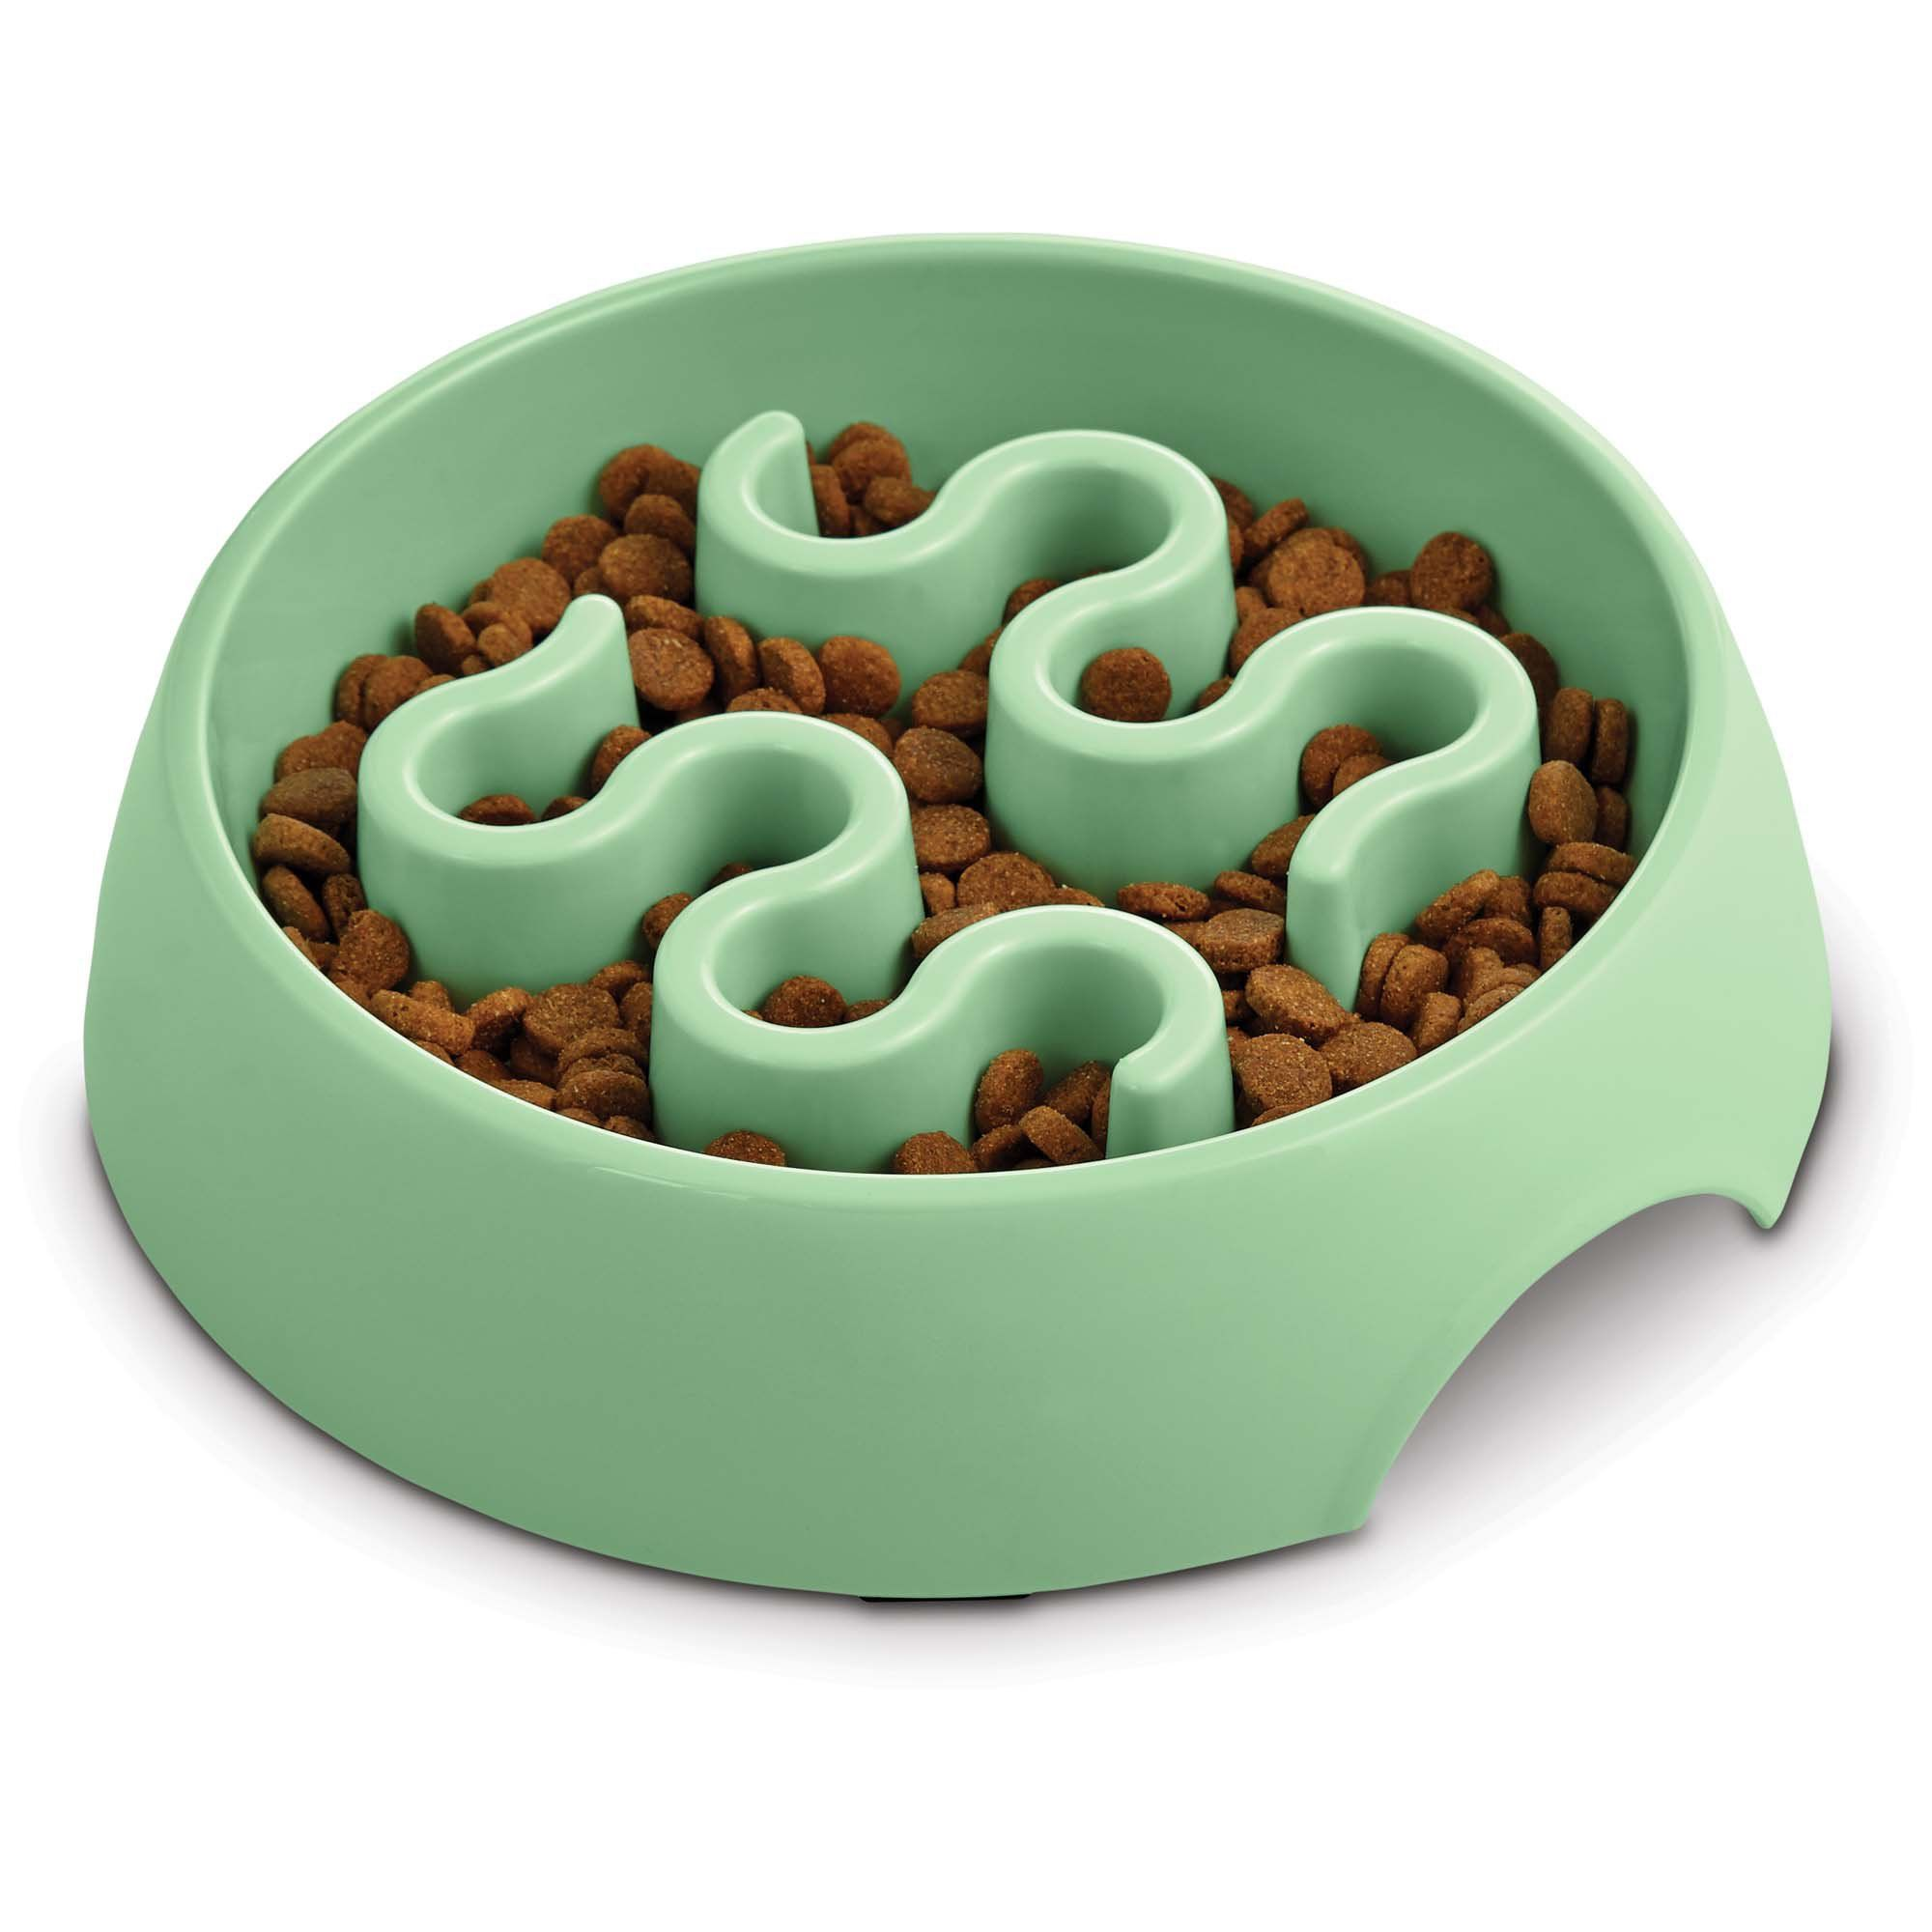 Harmony Mint Plastic Slow Feeder Dog Bowl Small Dog Bowls Slow